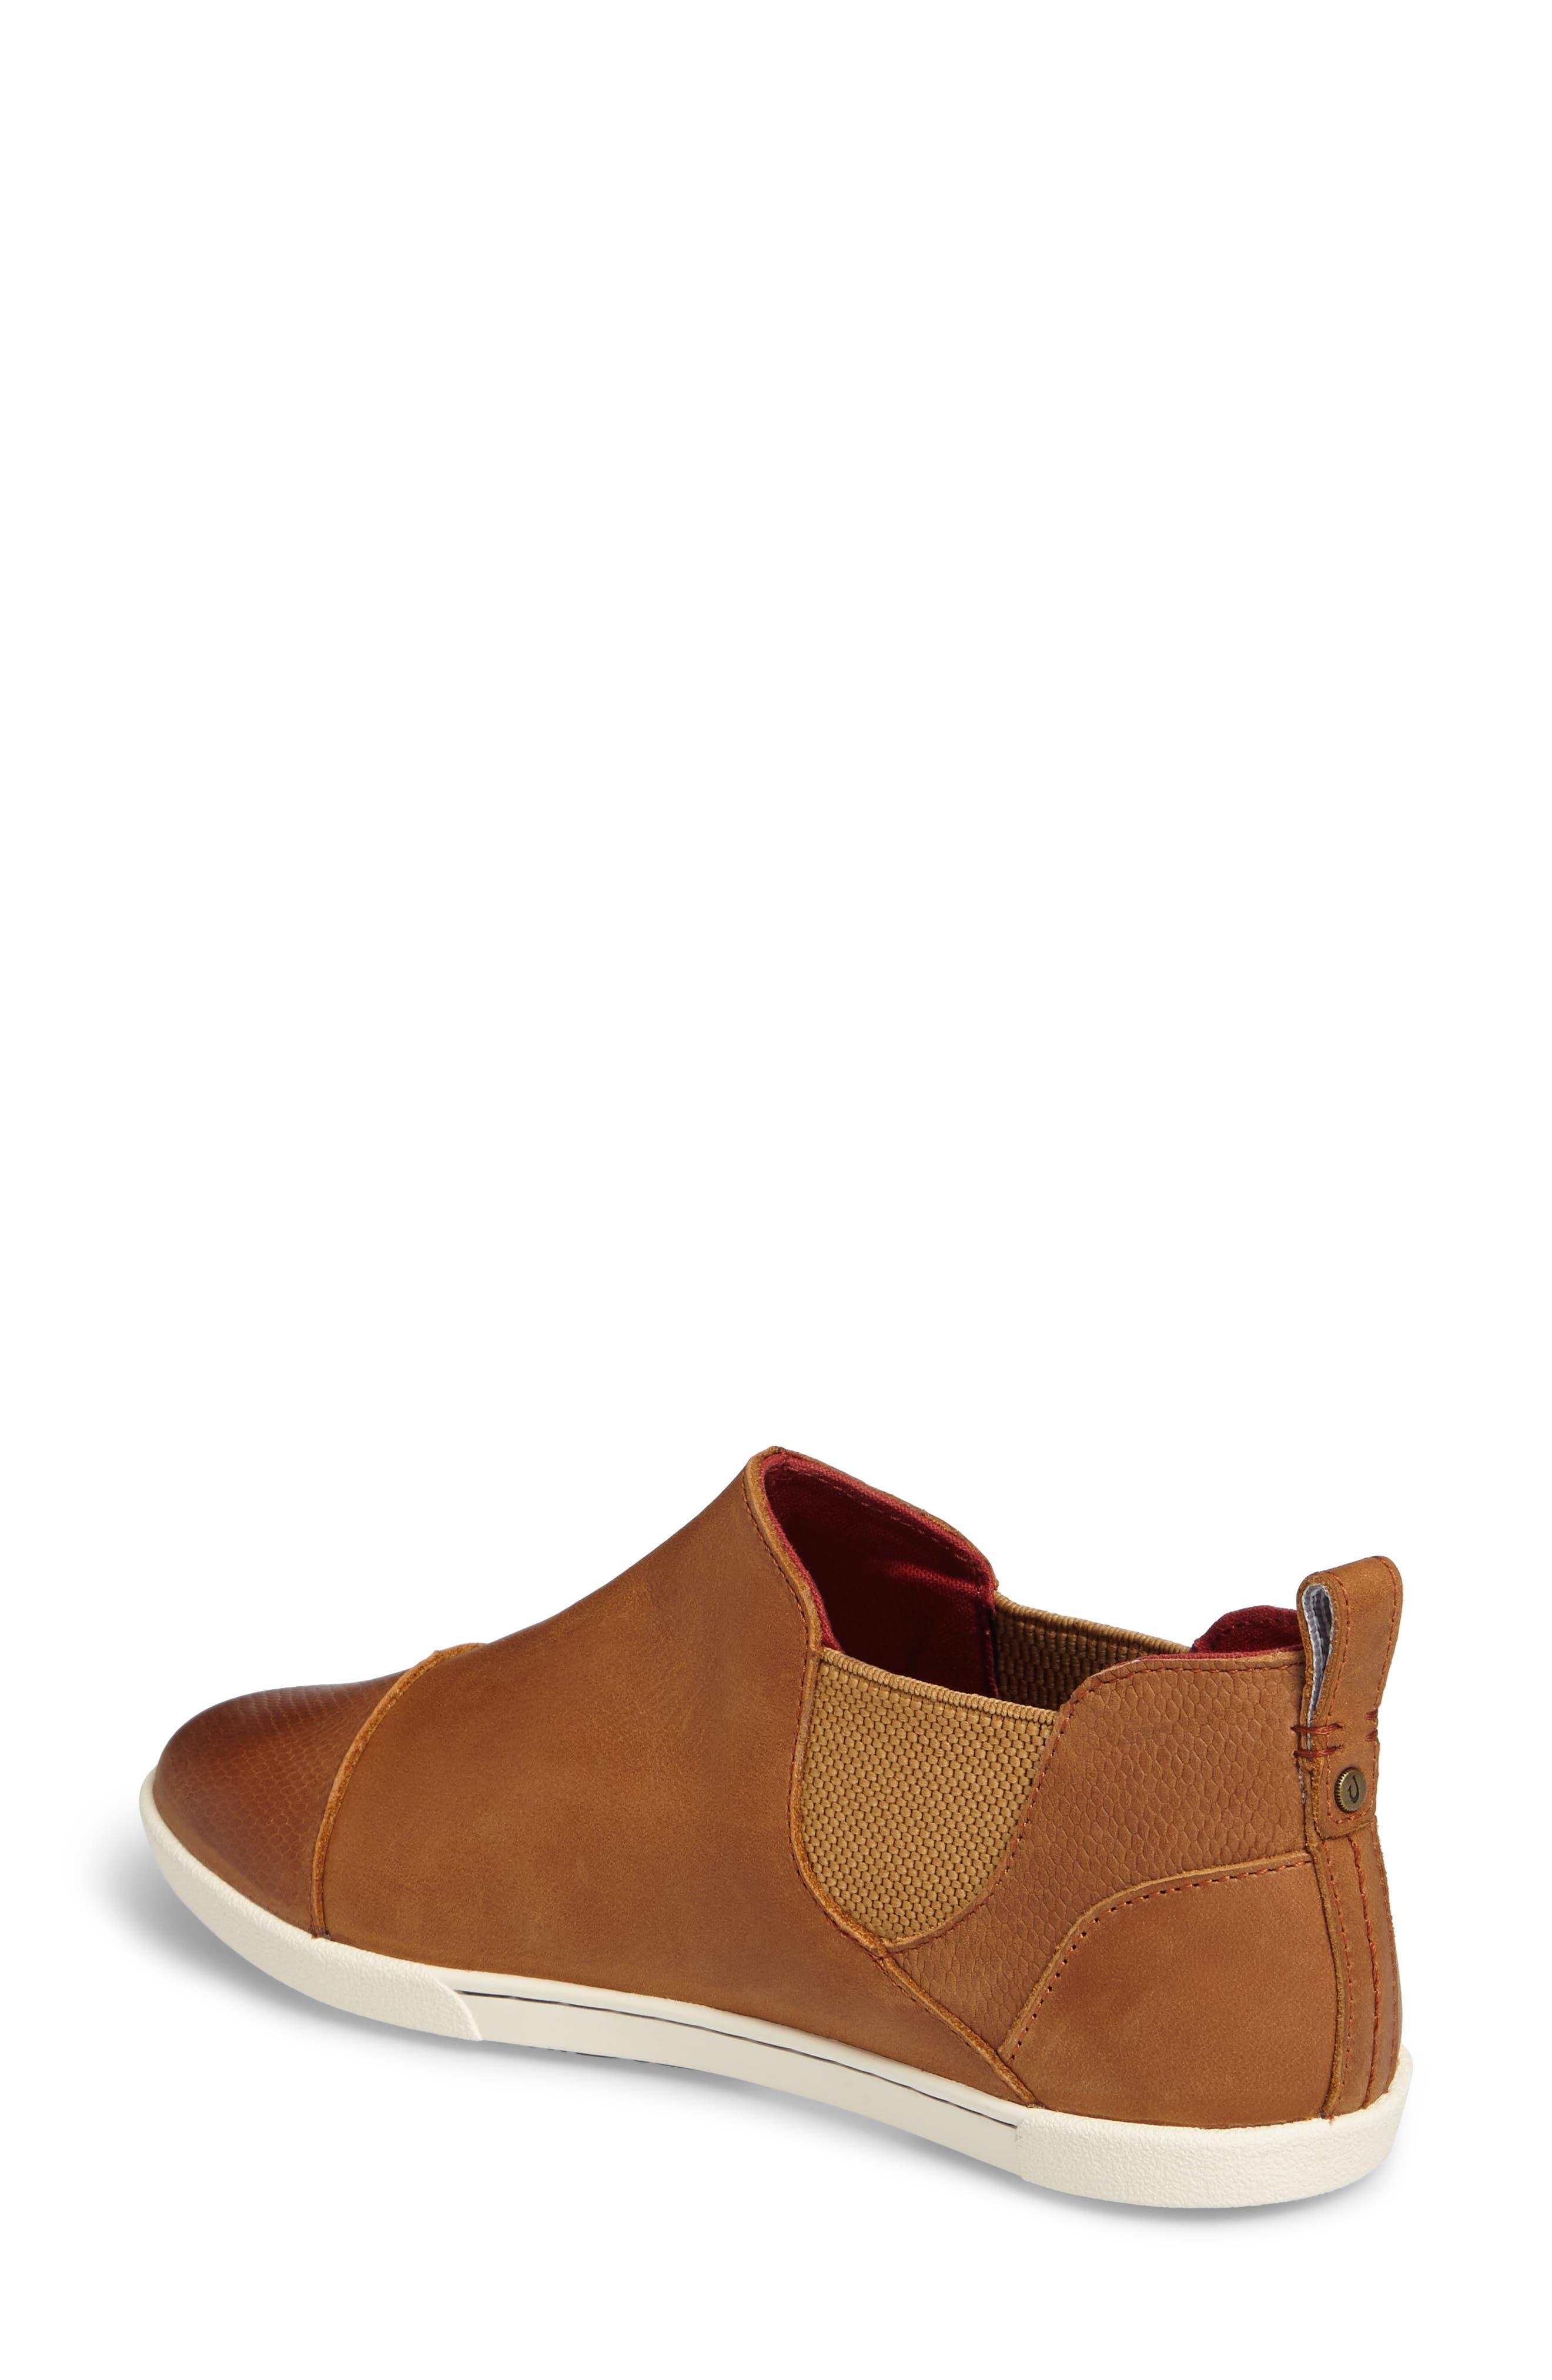 Alternate Image 2  - OluKai Waipahe Chelsea Sneaker (Women)